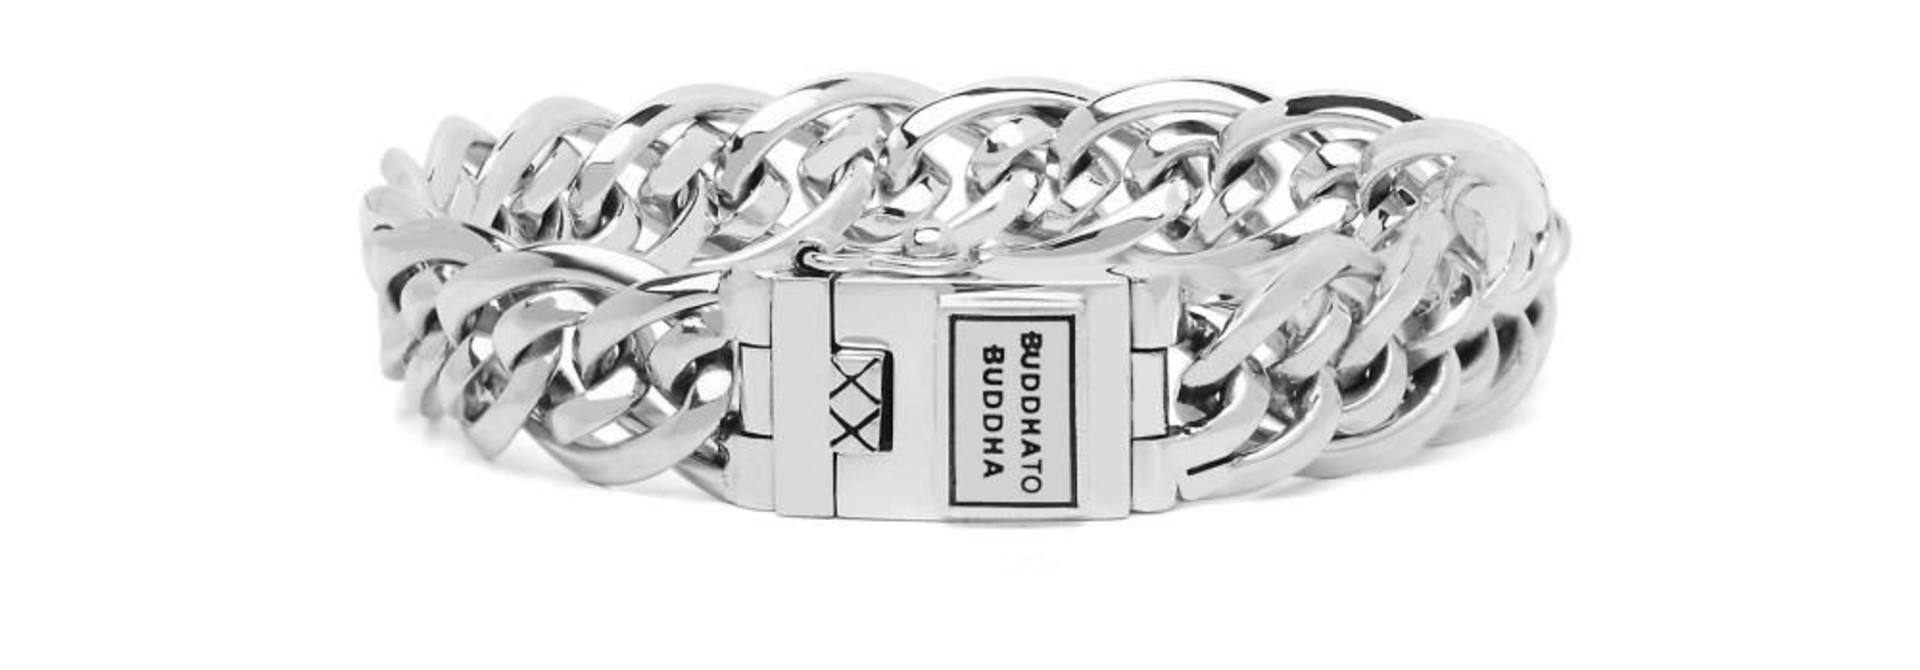 Nathalie XS Bracelet